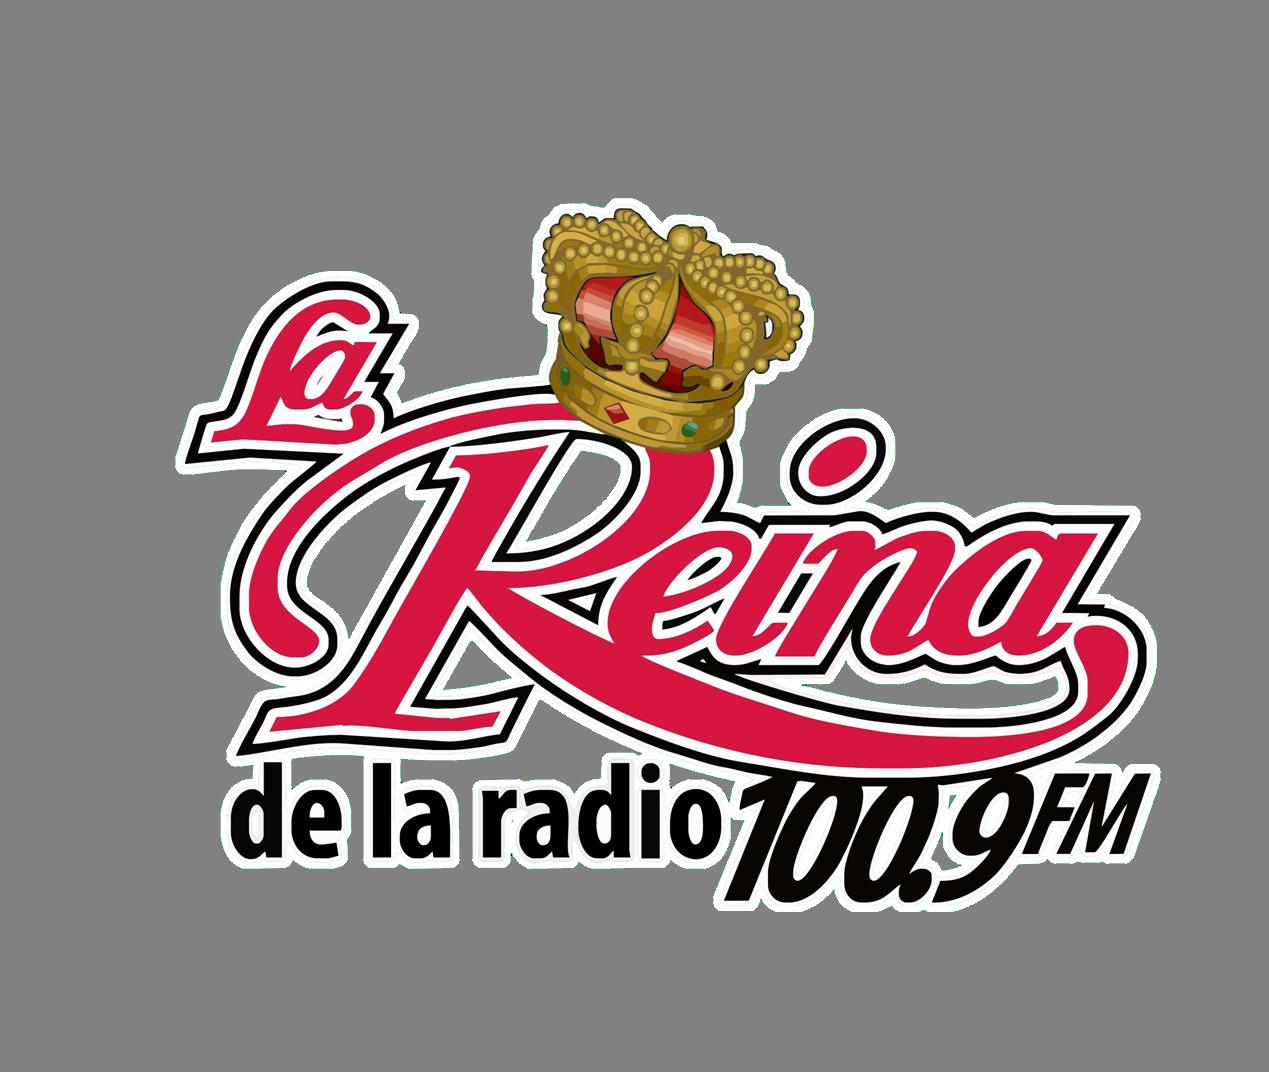 LA REINA 100.9FM ¡LA QUE MANDA! LA NÚMERO 1#